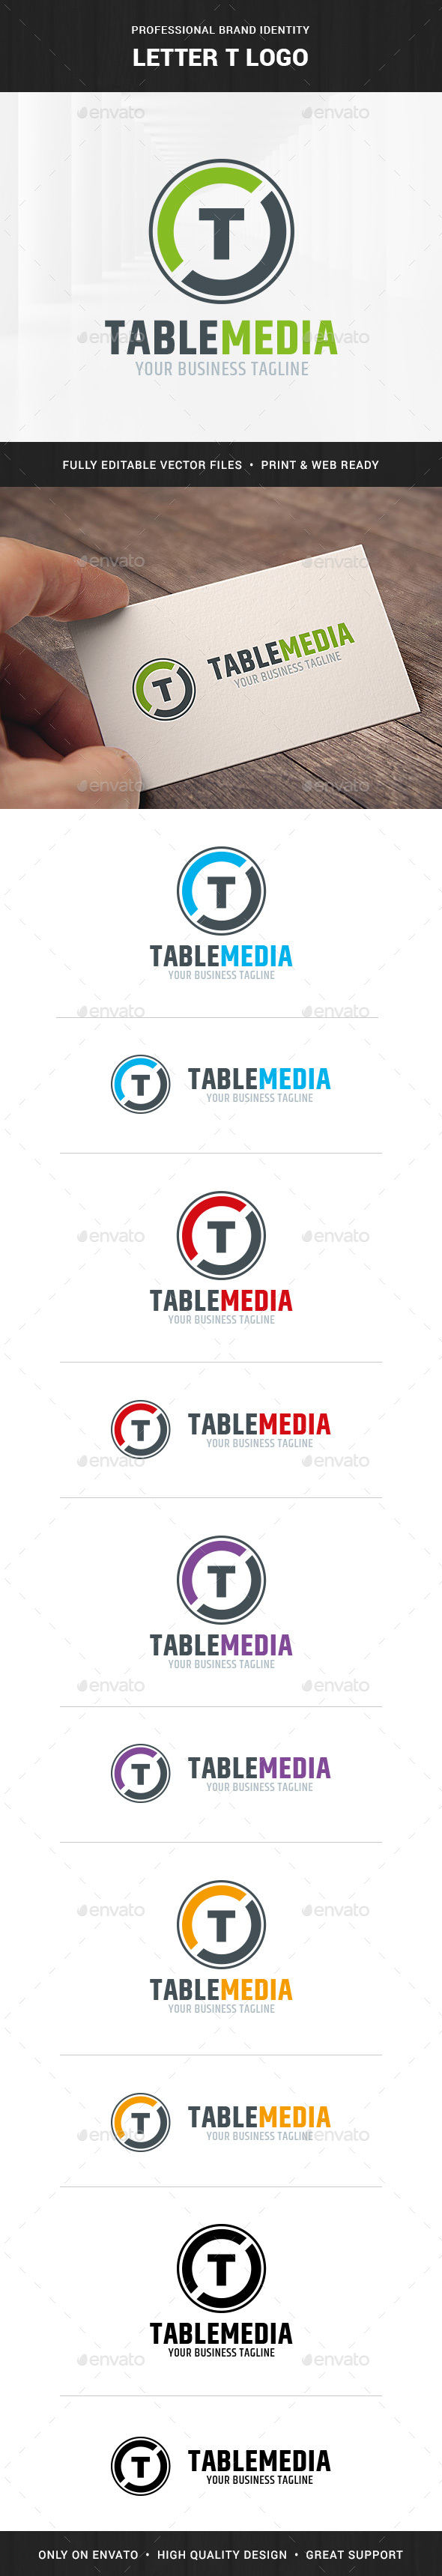 Letter T Logo Template - Letters Logo Templates